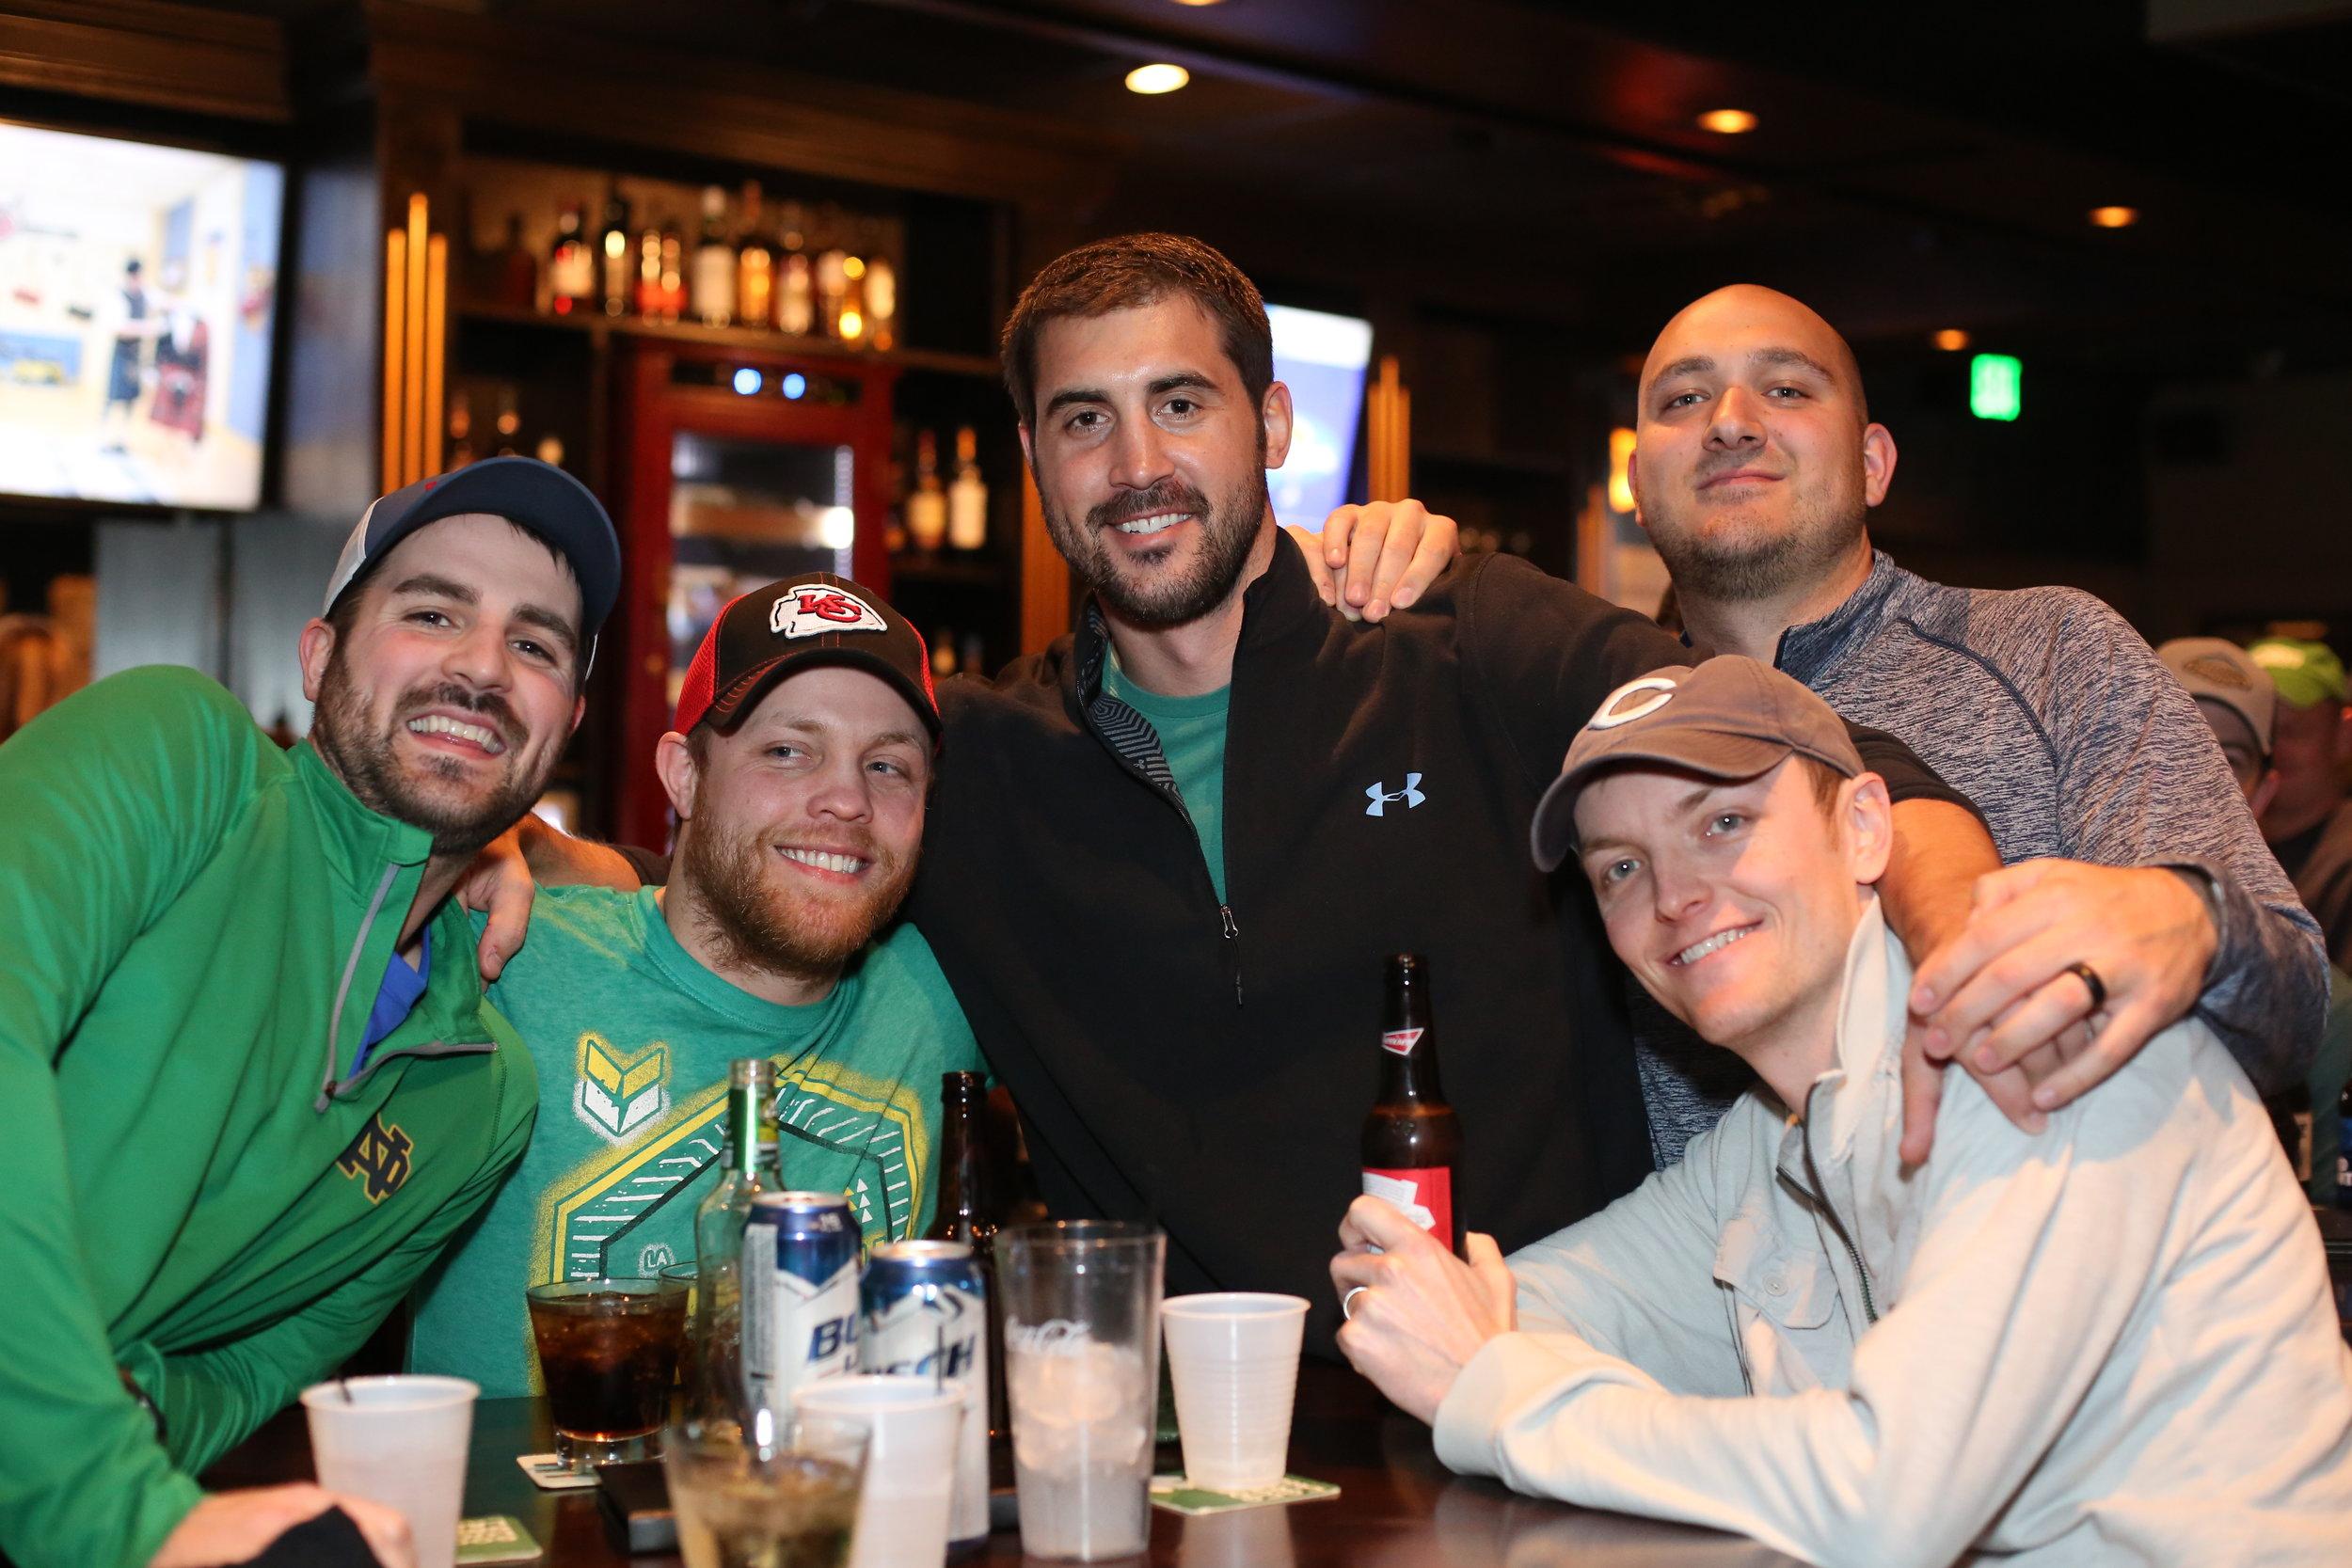 The Irish - Where Friends Meet in West Des Moines